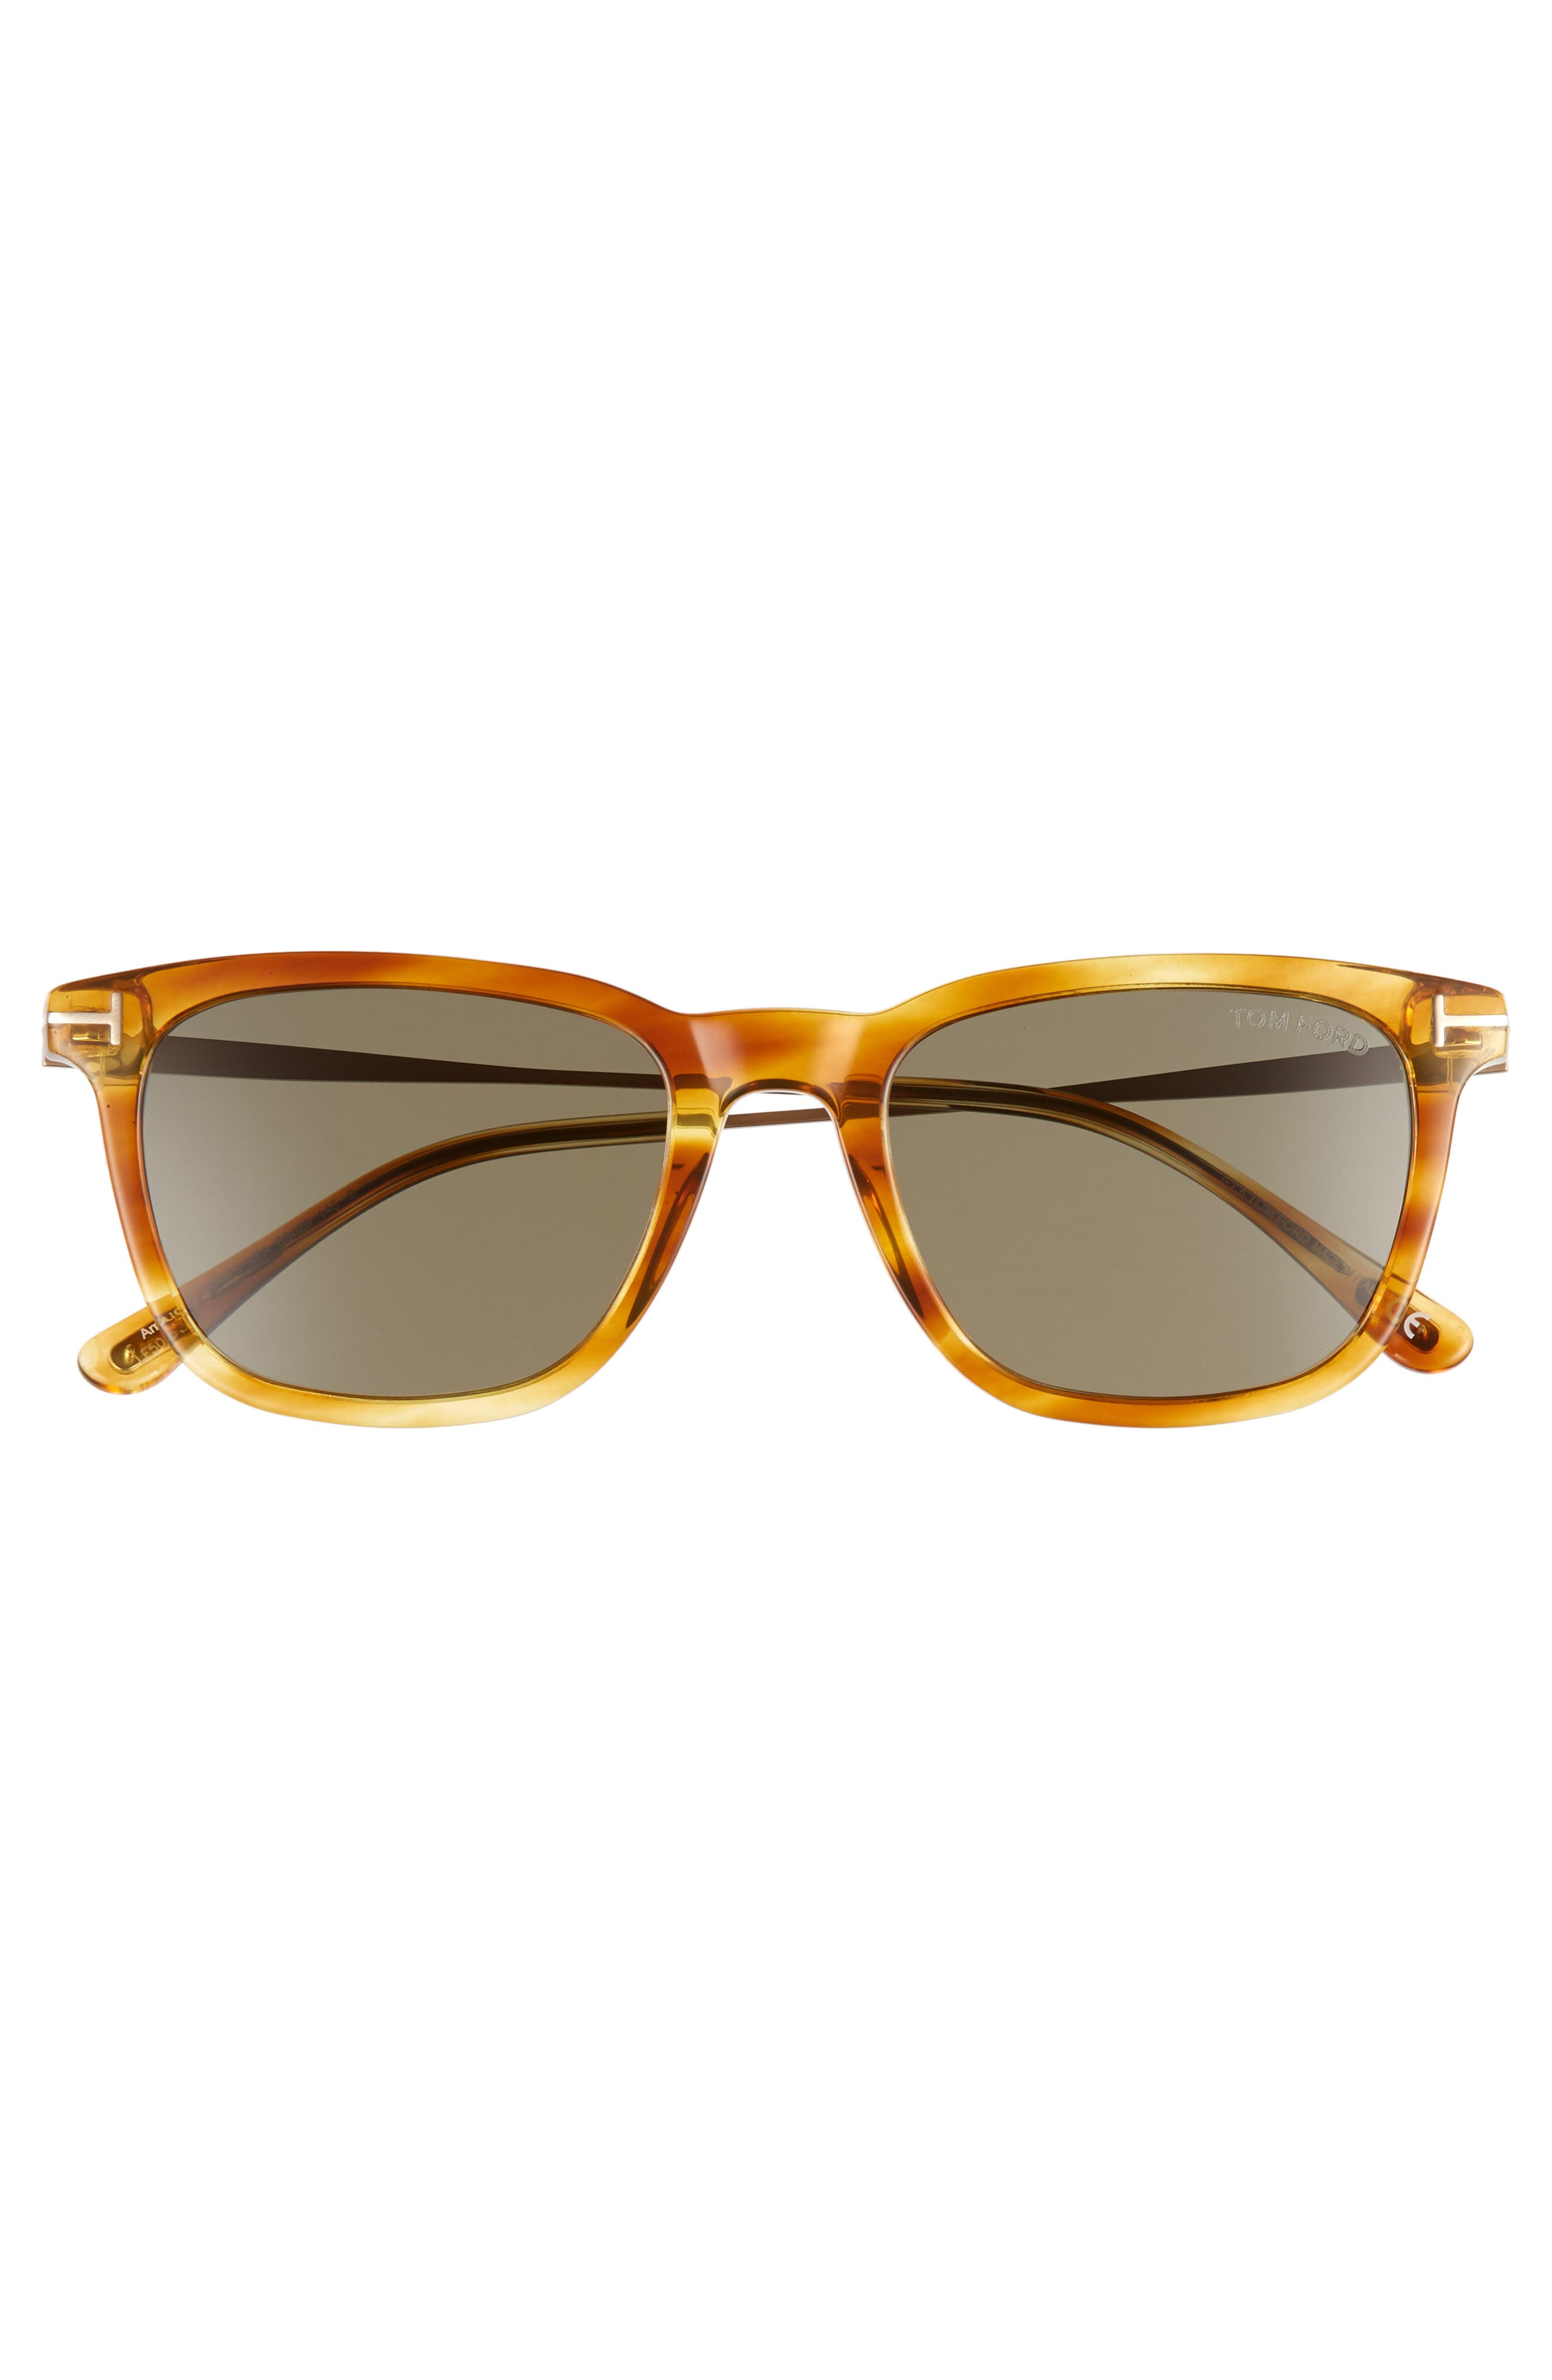 53mm Rectangle Sunglasses,                             Alternate thumbnail 3, color,                             LIGHT BROWN/ SMOKE